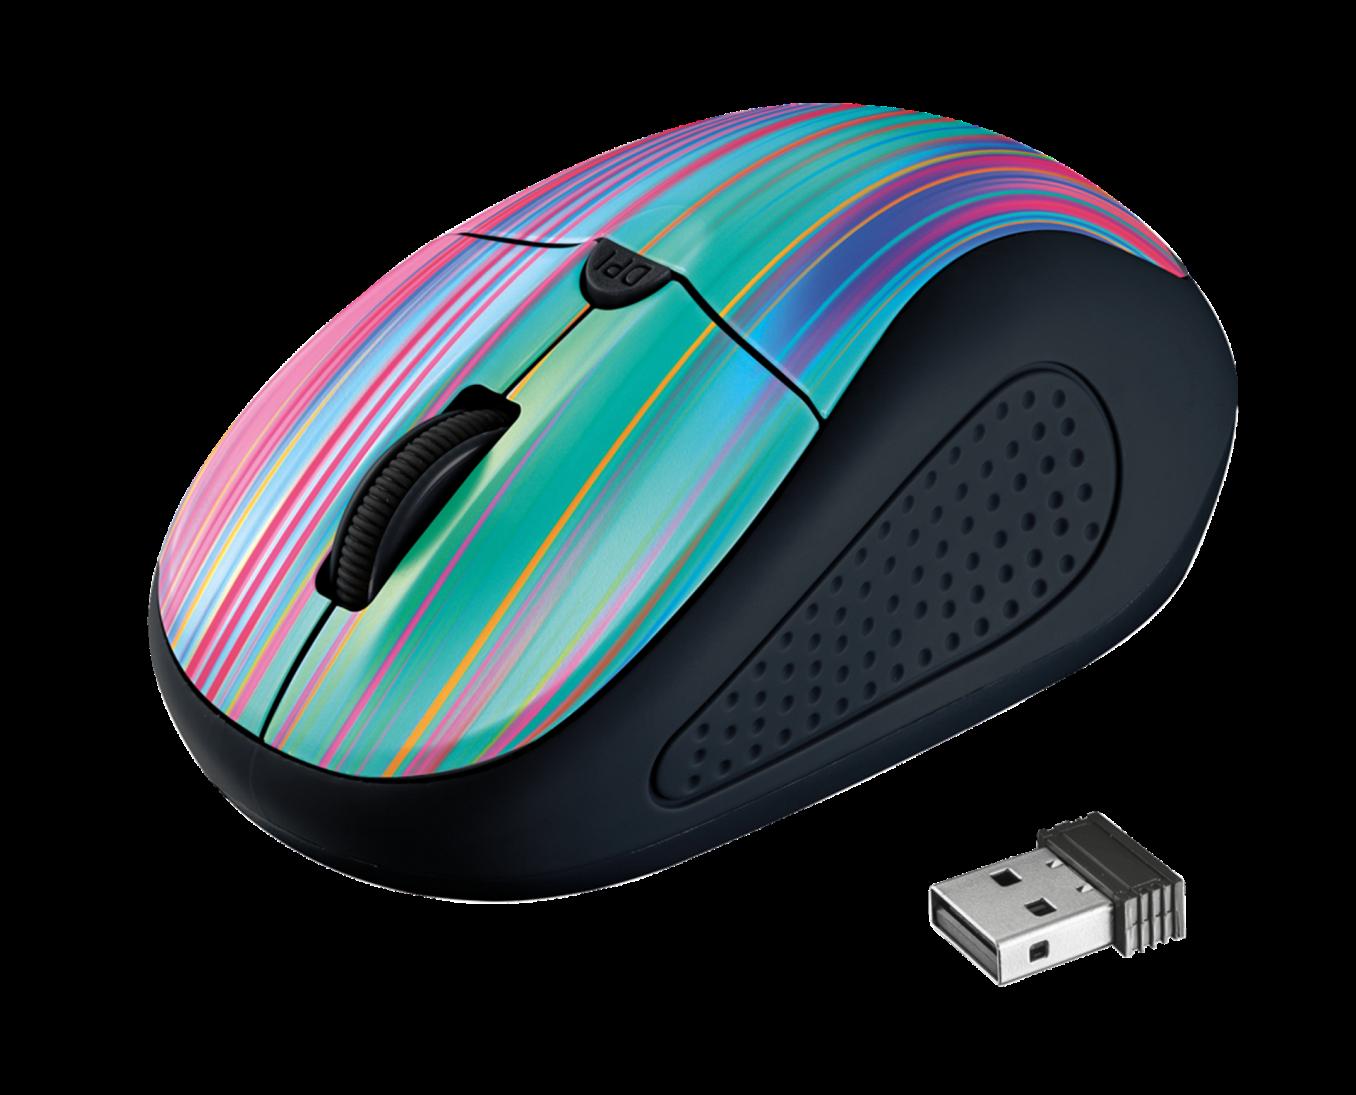 myš TRUST Primo Wireless Mouse - black rainbow